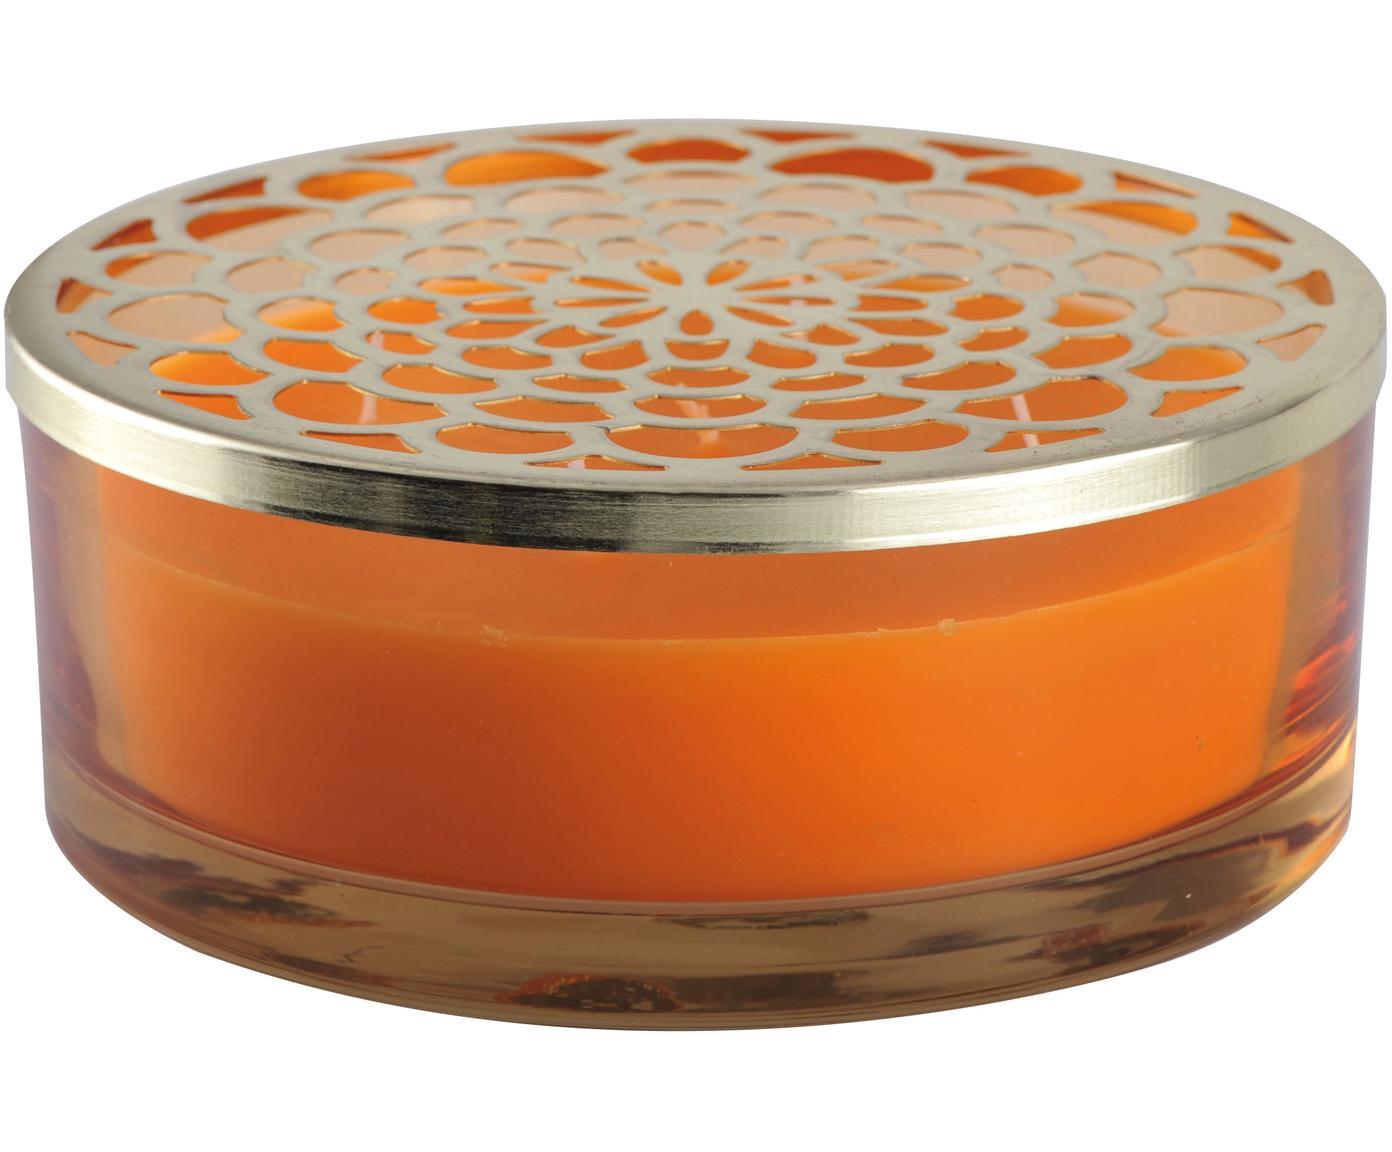 Vela perfumada Narana (naranja), Recipiente: cristal, Dorado, naranja, Ø 20 x Al 8 cm